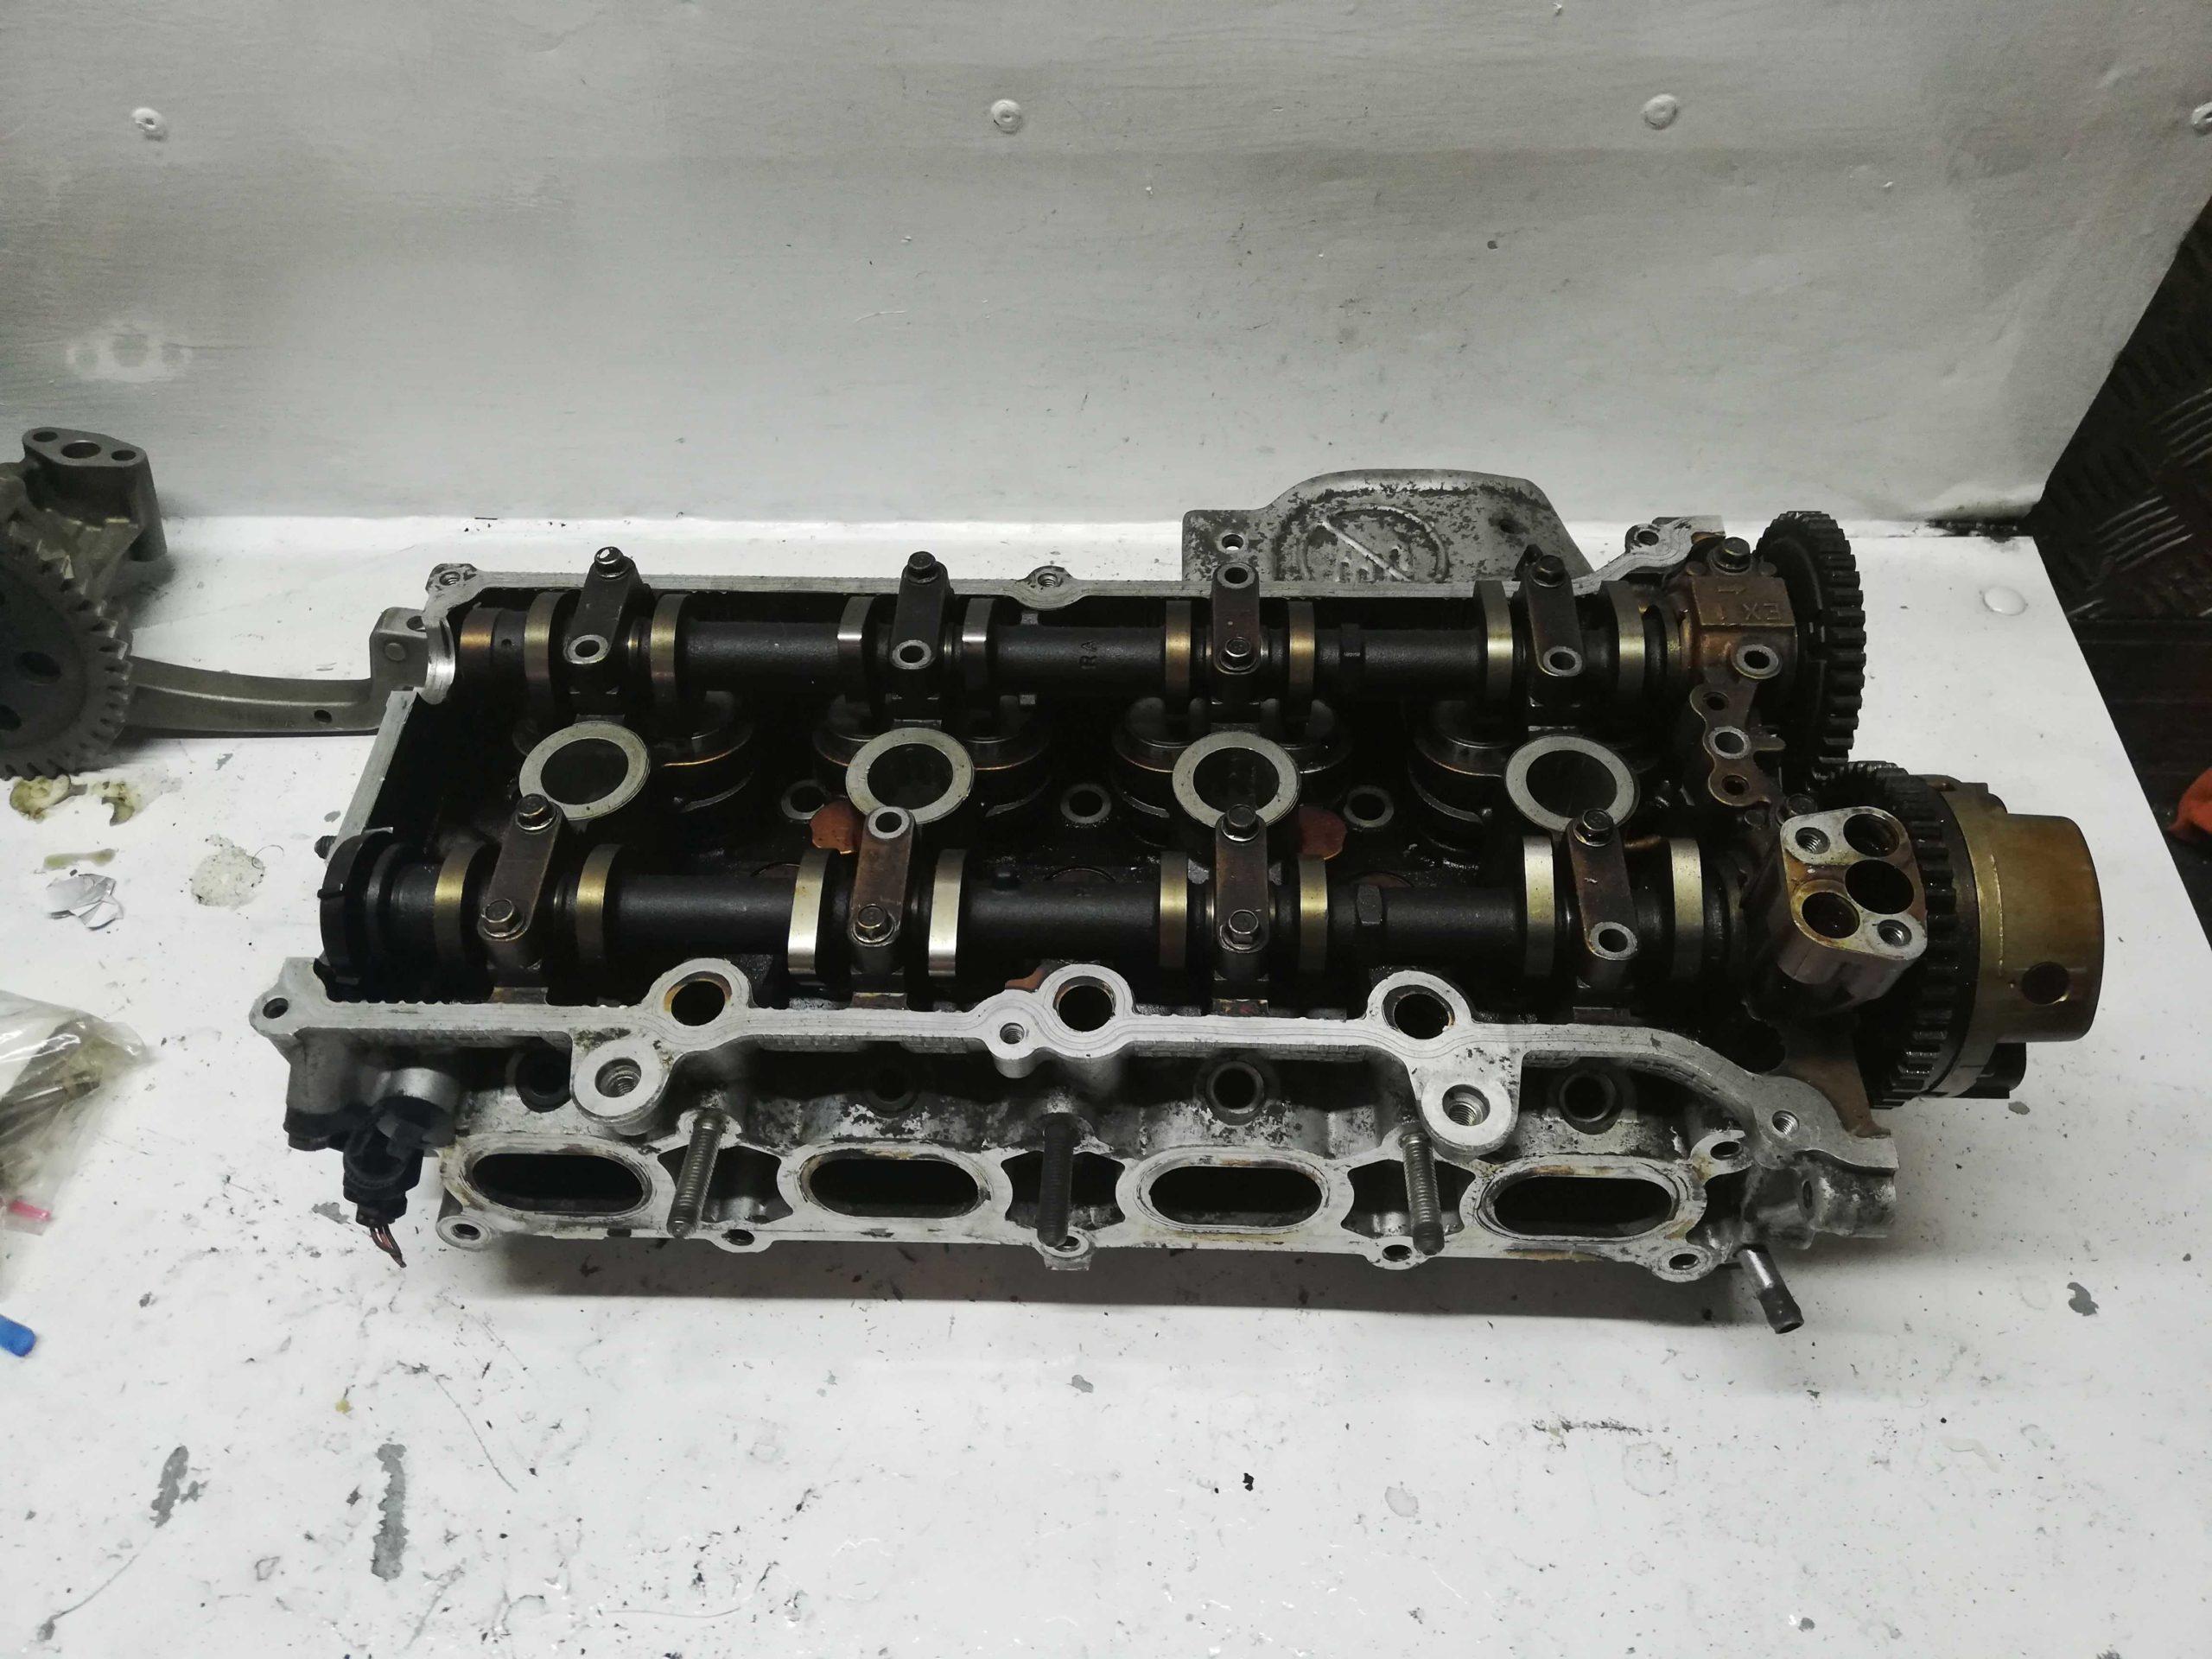 Kompletna Głowica Suzuki 1.6 B 16V 2005-2014